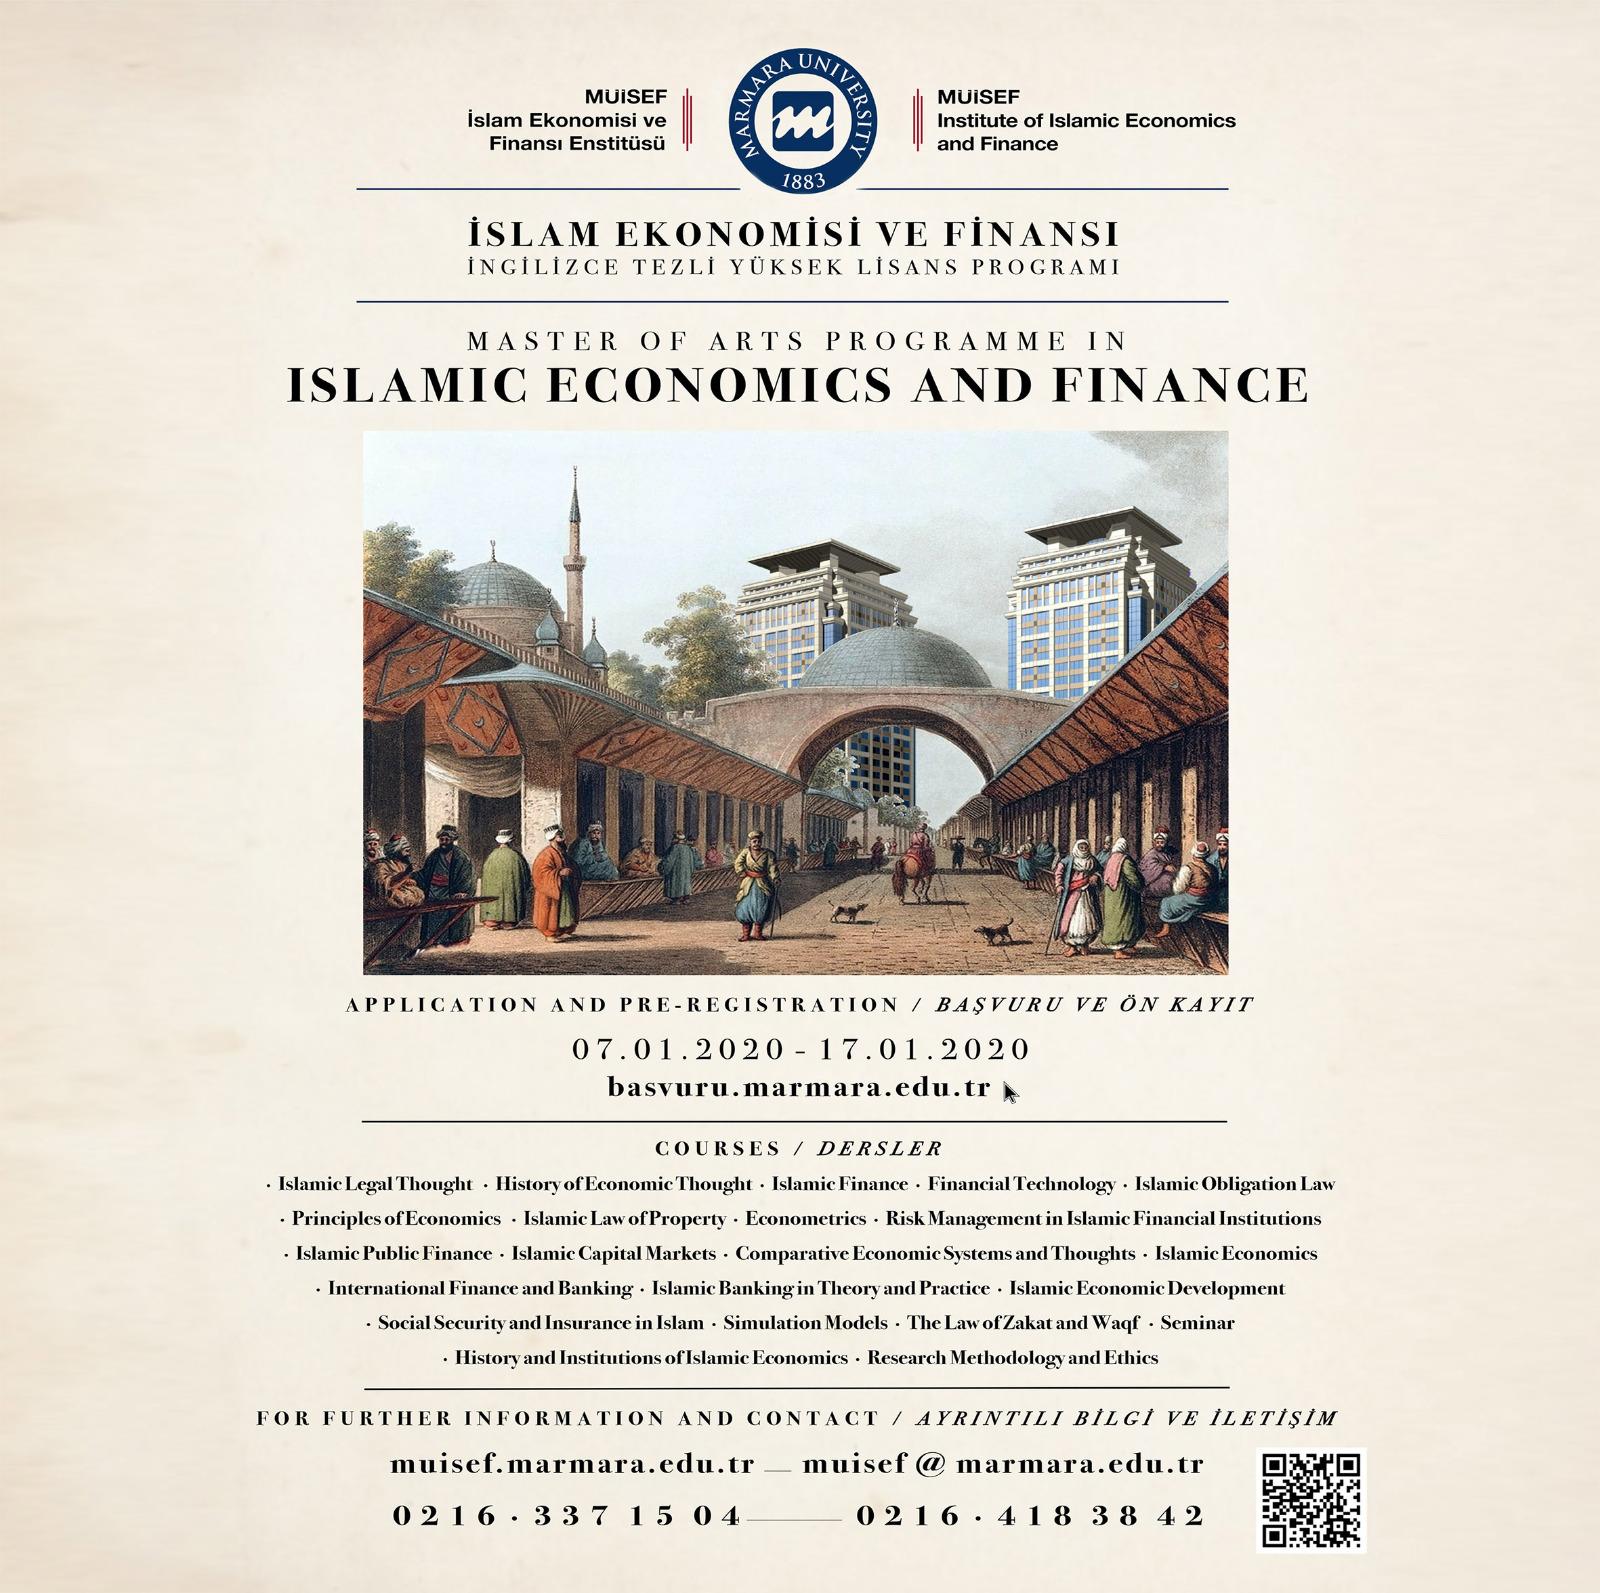 MA Program in Islamic Economics and Finance